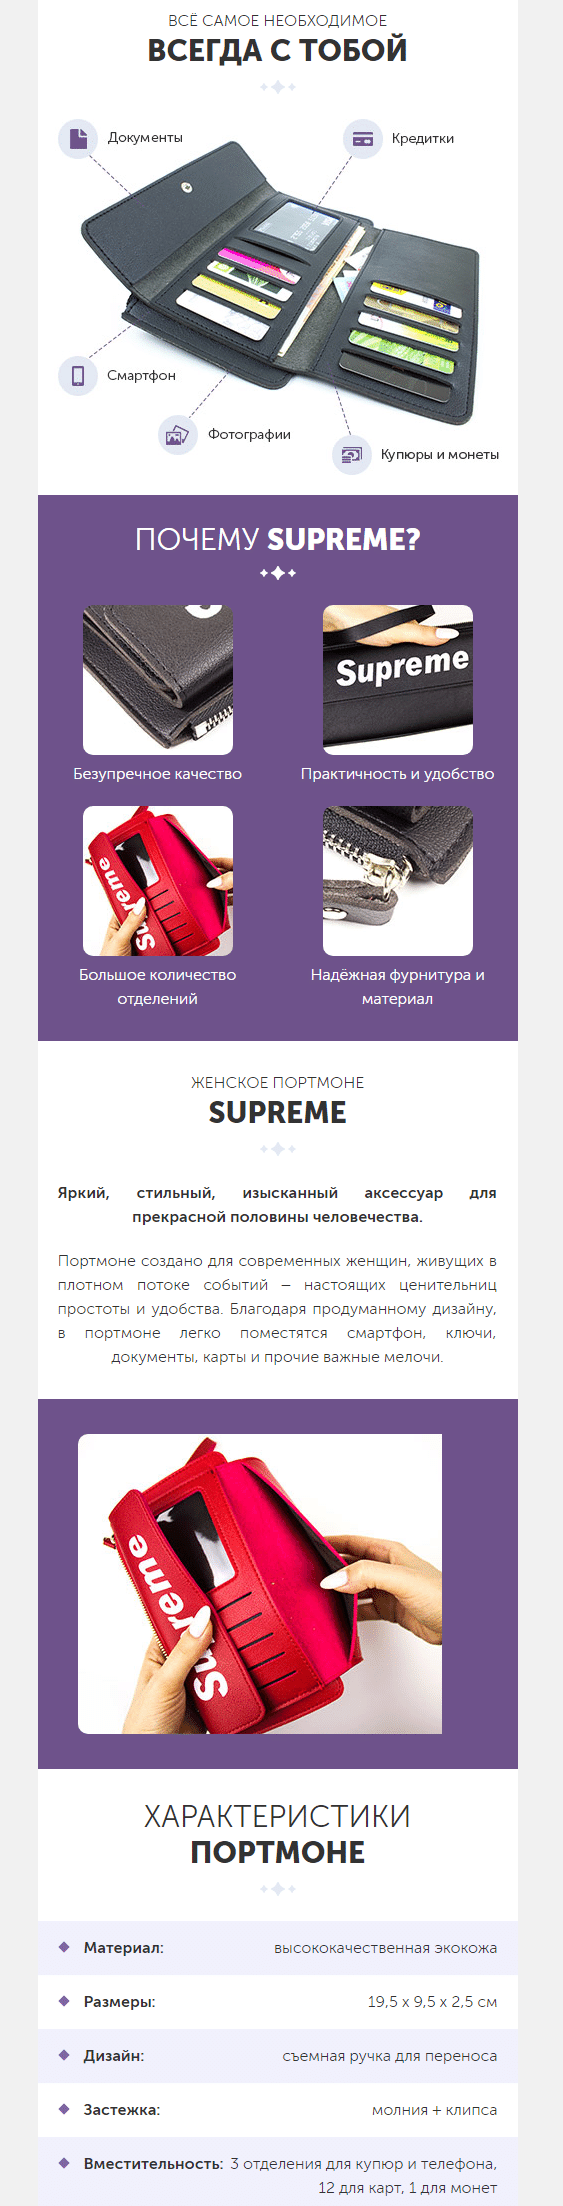 2c13d794231a Женское портмоне Supreme от Louis Vuitton купить.  pic_ea4beb64f5e3143_1920x9000_1.png. Смотреть полное описание